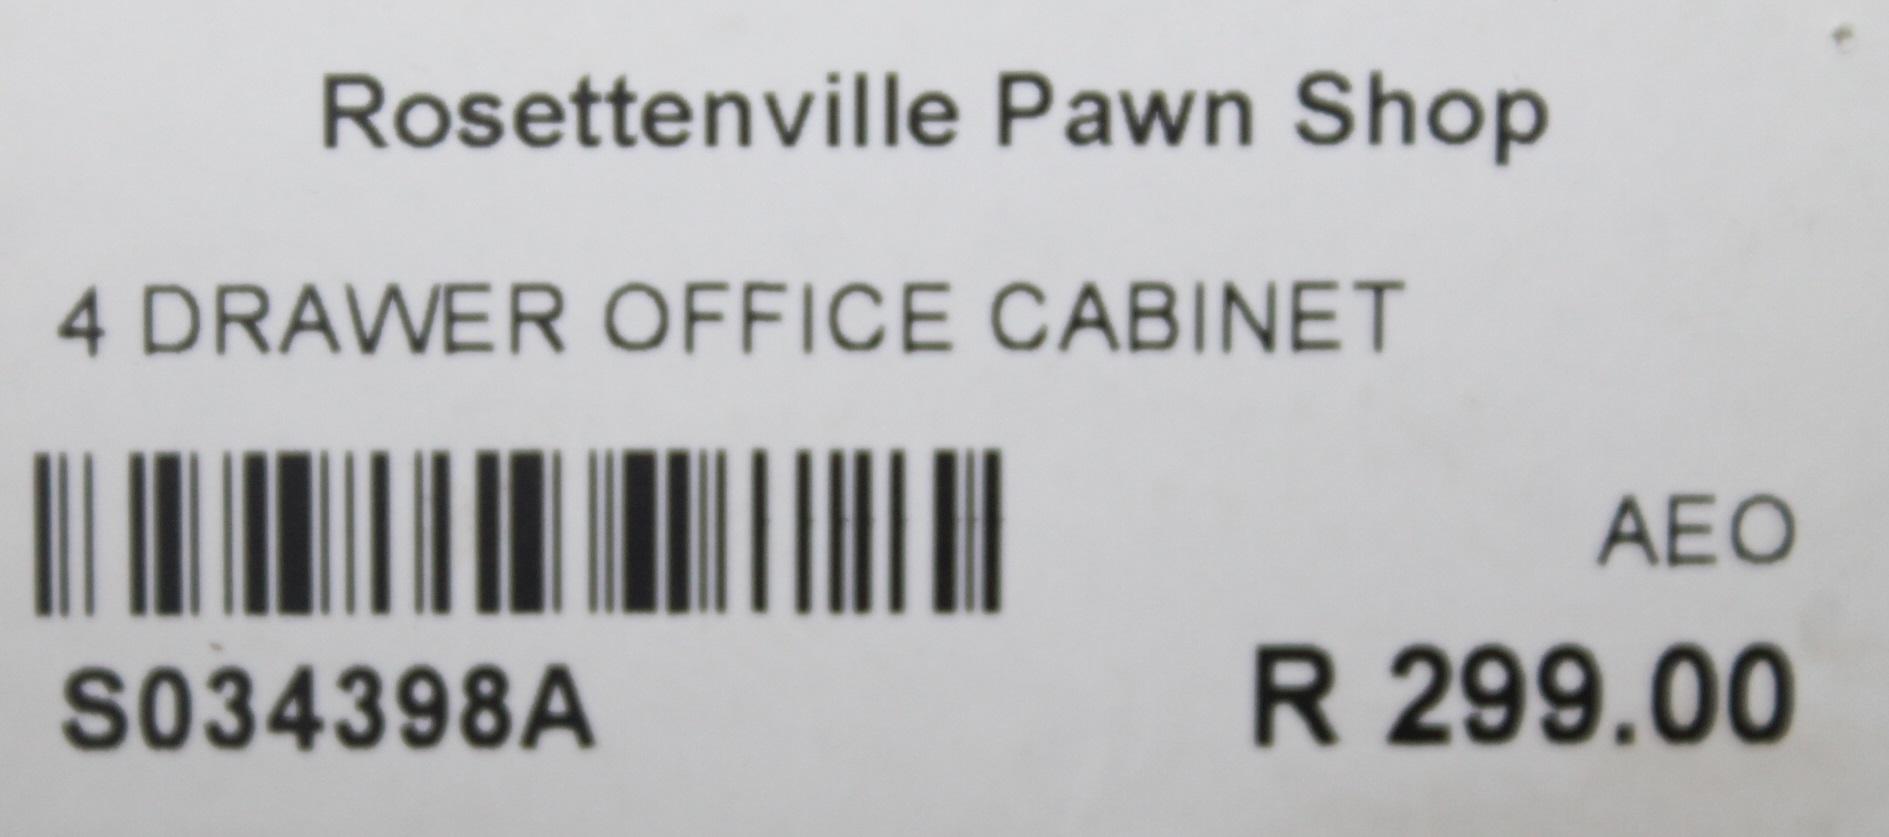 S034398A 4 Drawer office cabinet #Rosettenvillepawnshop